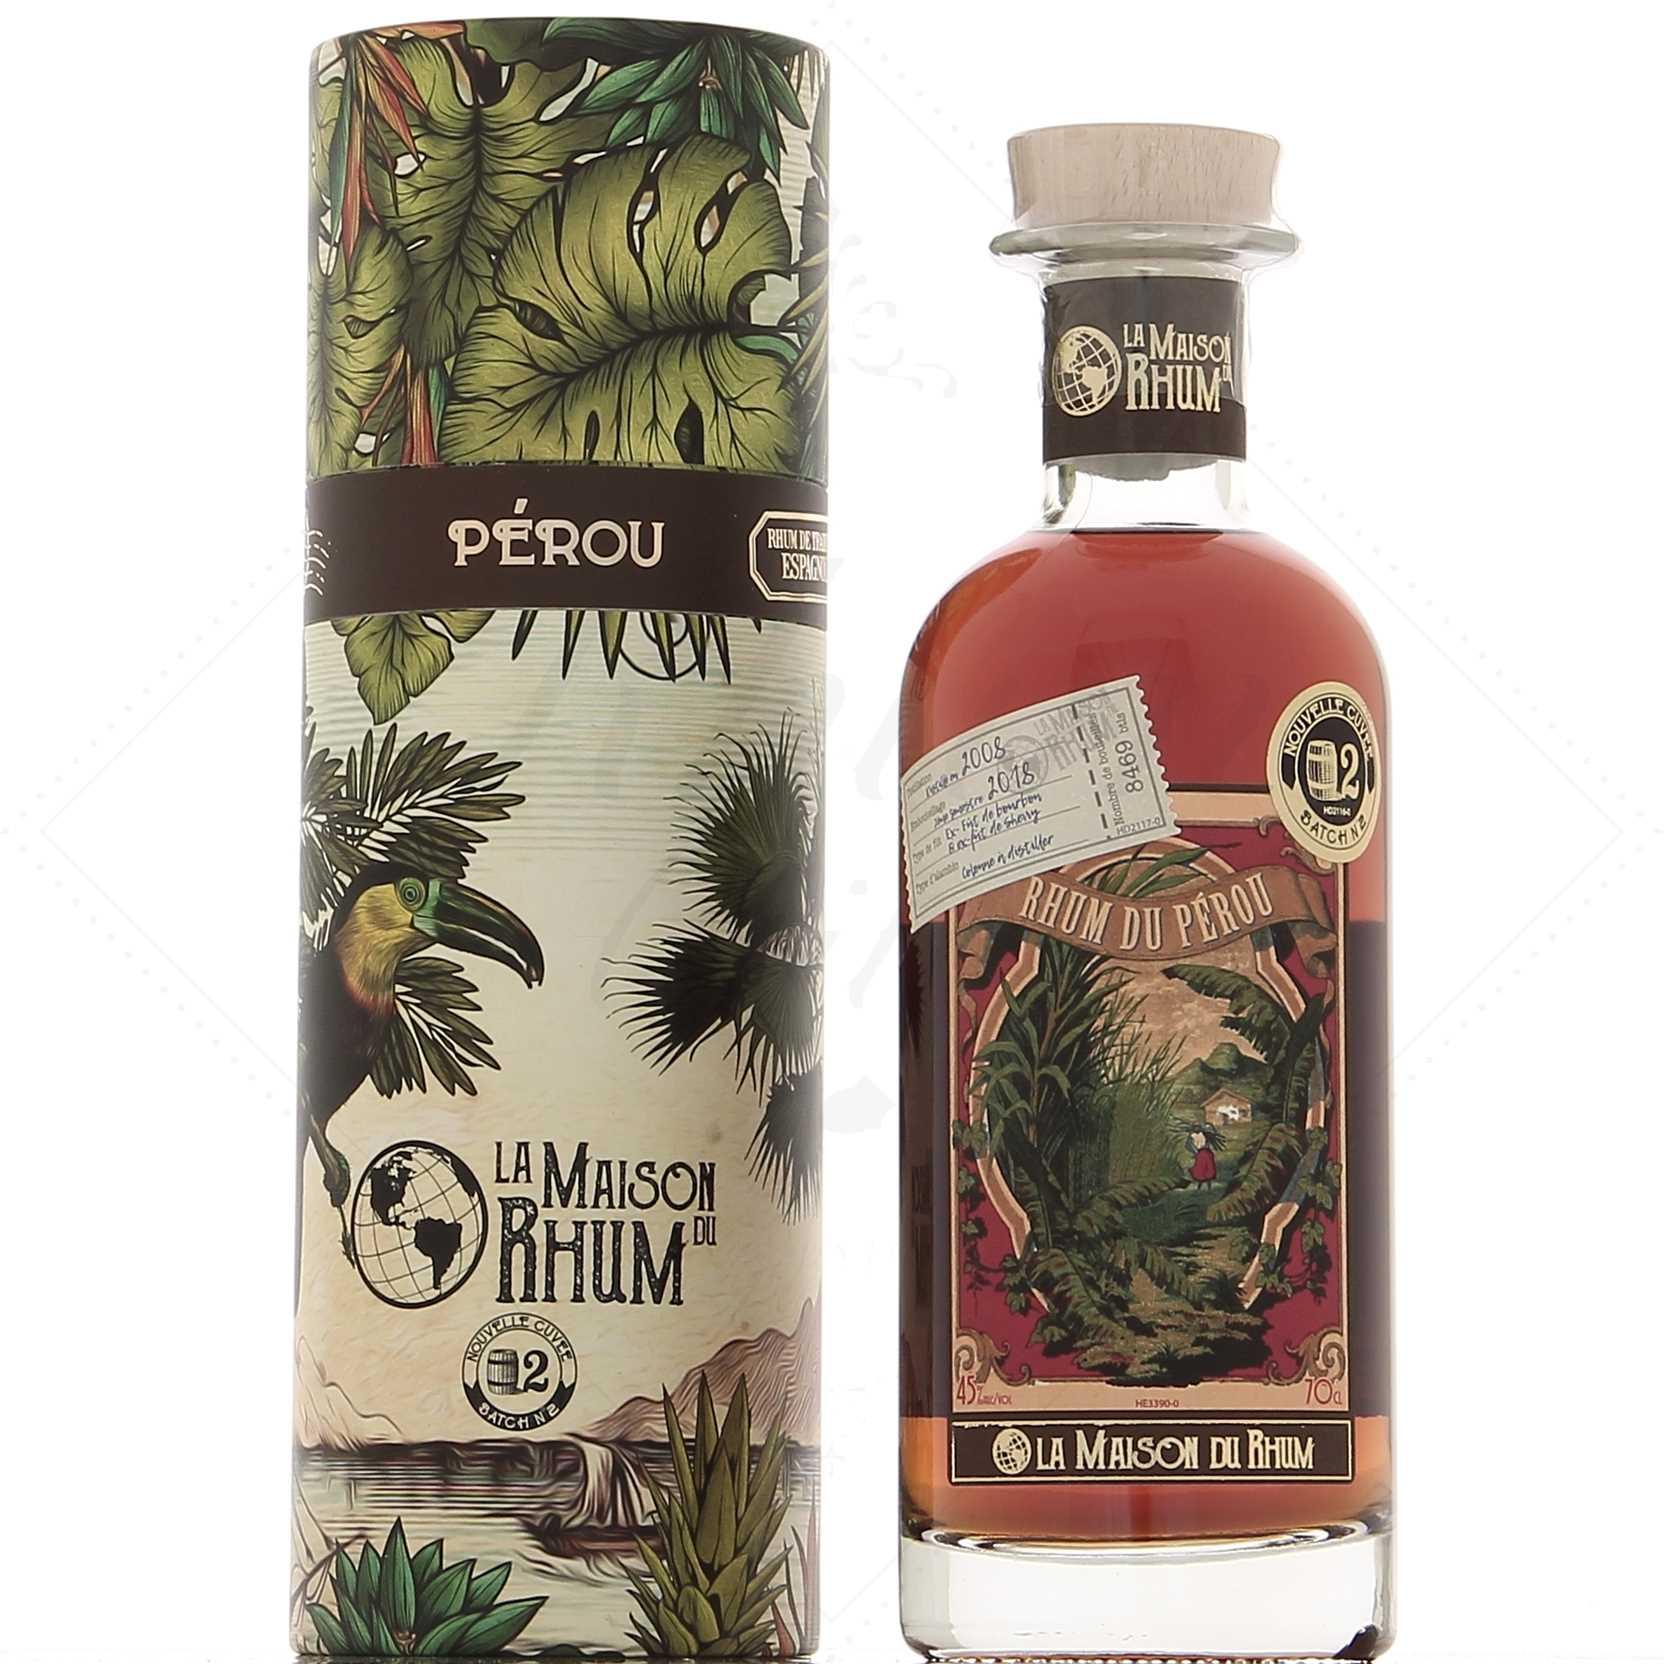 La Maison Du Rhum Perou Distillerie Millonario 10 10°